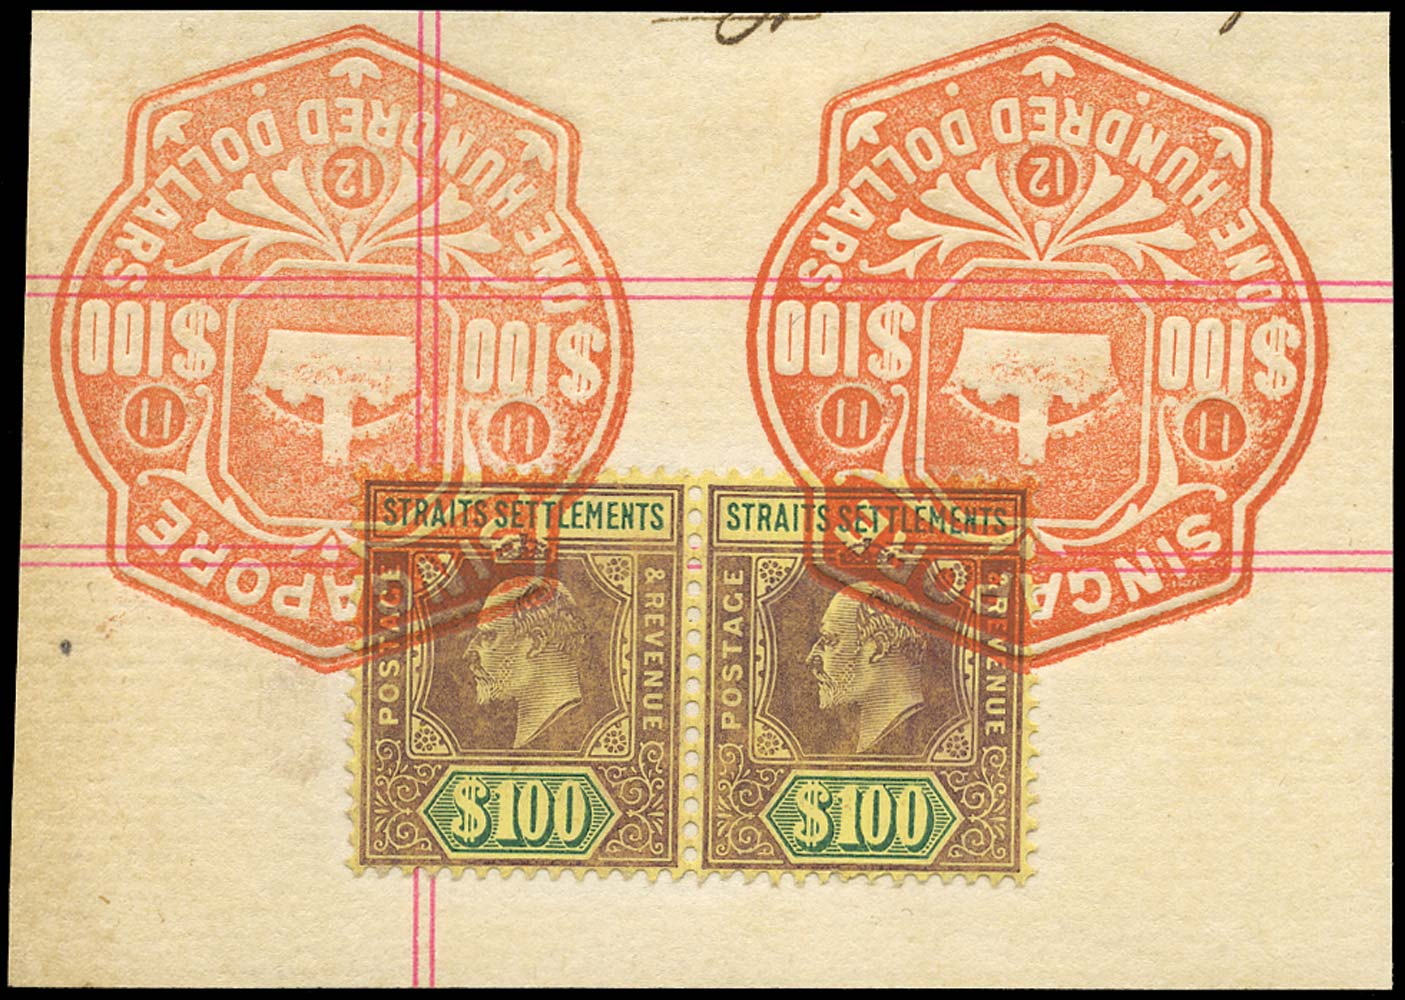 MALAYA - STRAITS 1904  SG140 Revenue $100 watermark MCA fiscally used